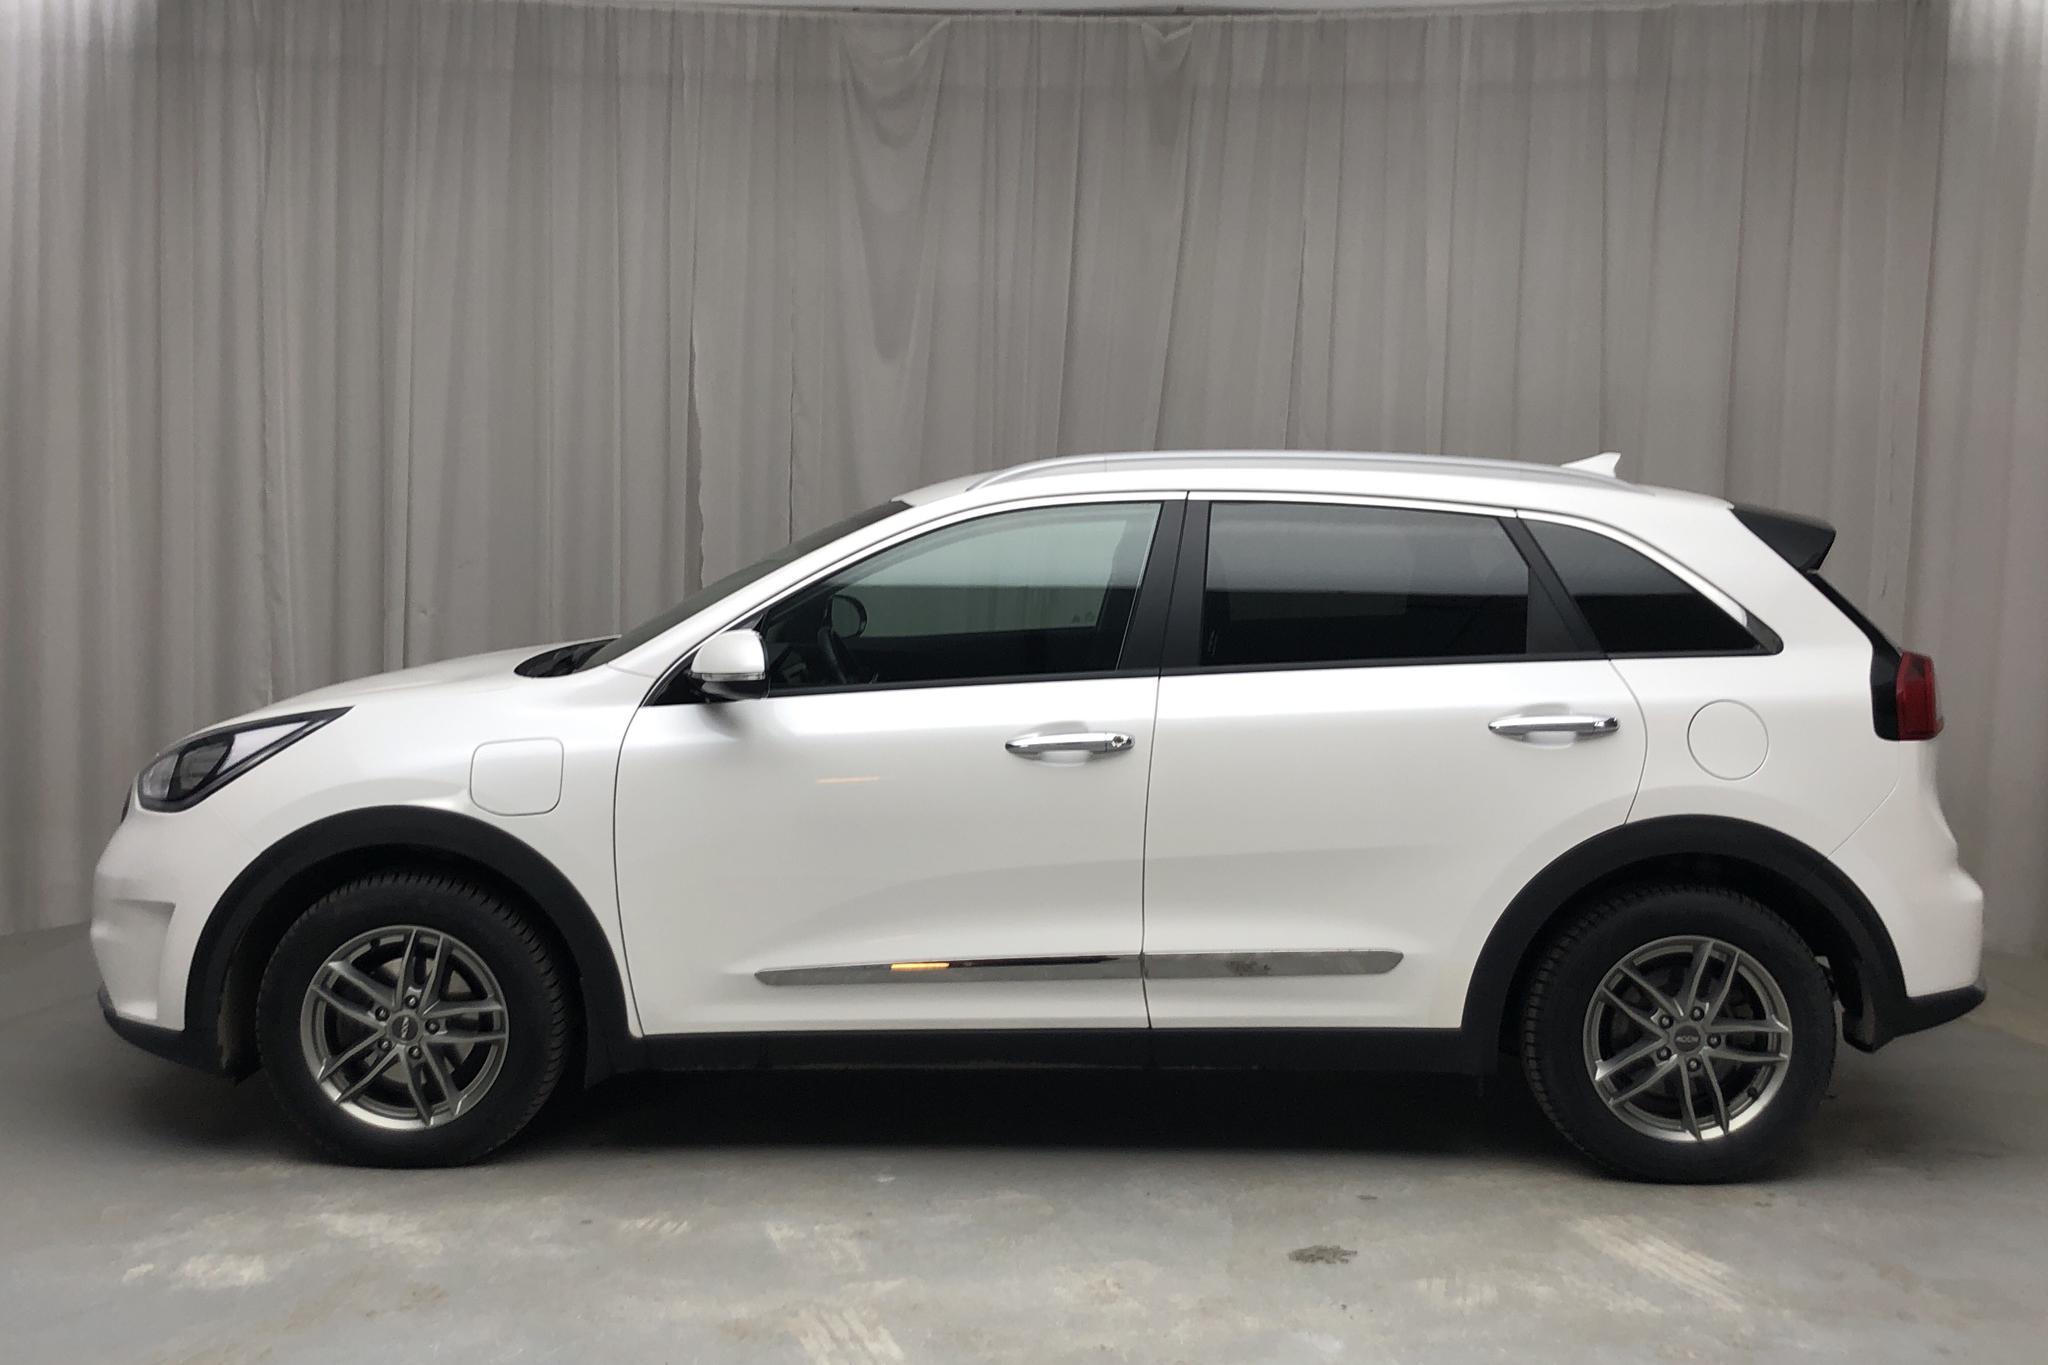 KIA Niro Plug-in Hybrid 1.6 (141hk) - 50 610 km - Automatic - white - 2018